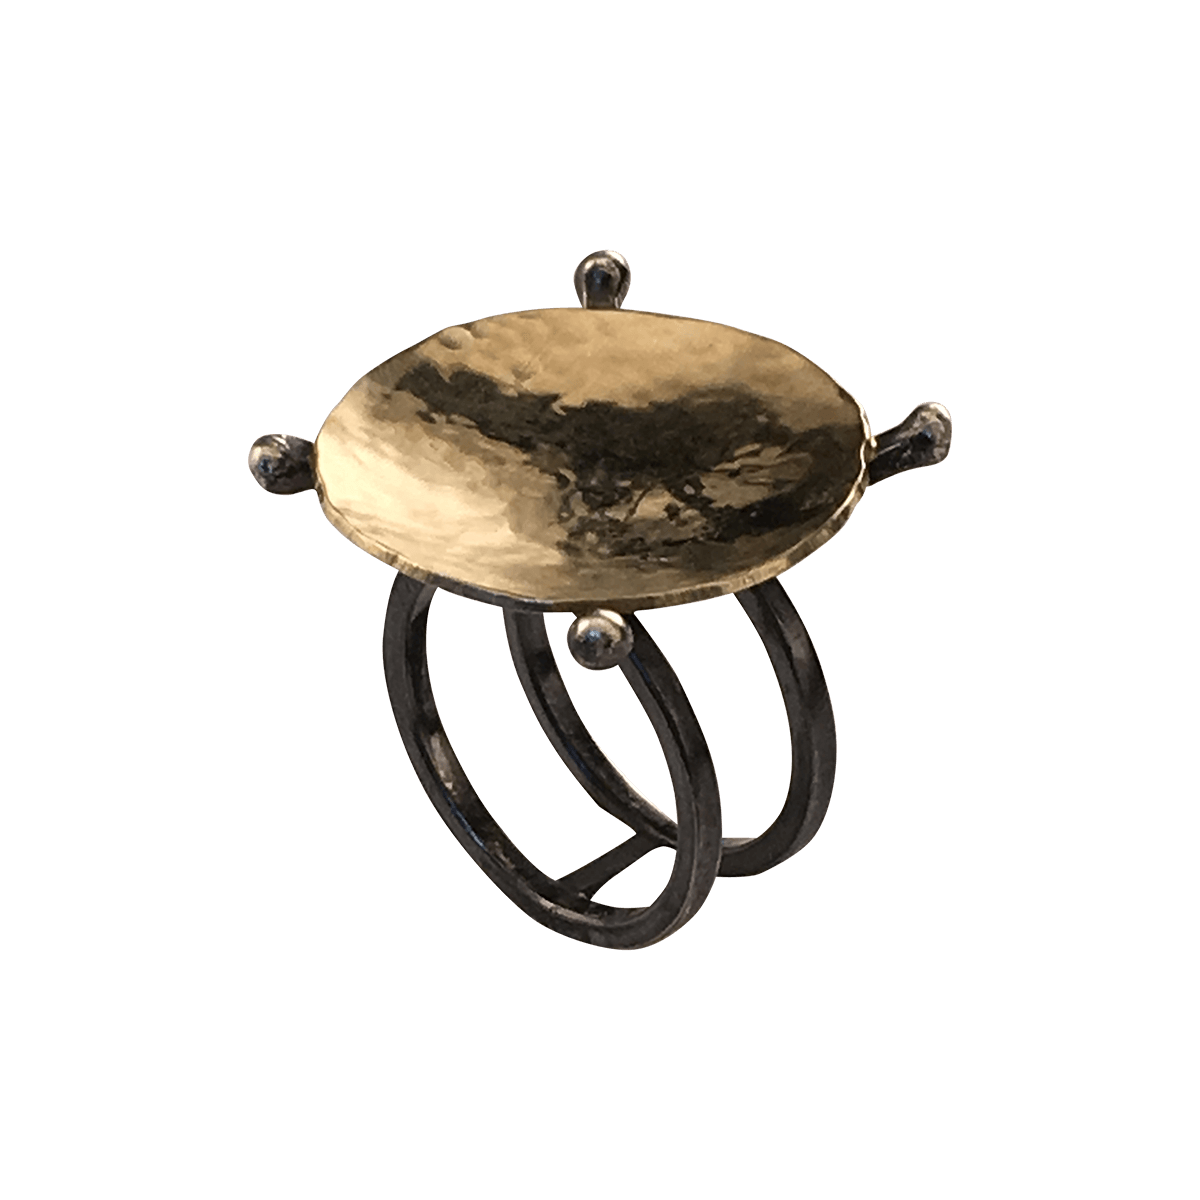 Pernille Müller - yppig ring i guld og oxideret sølv